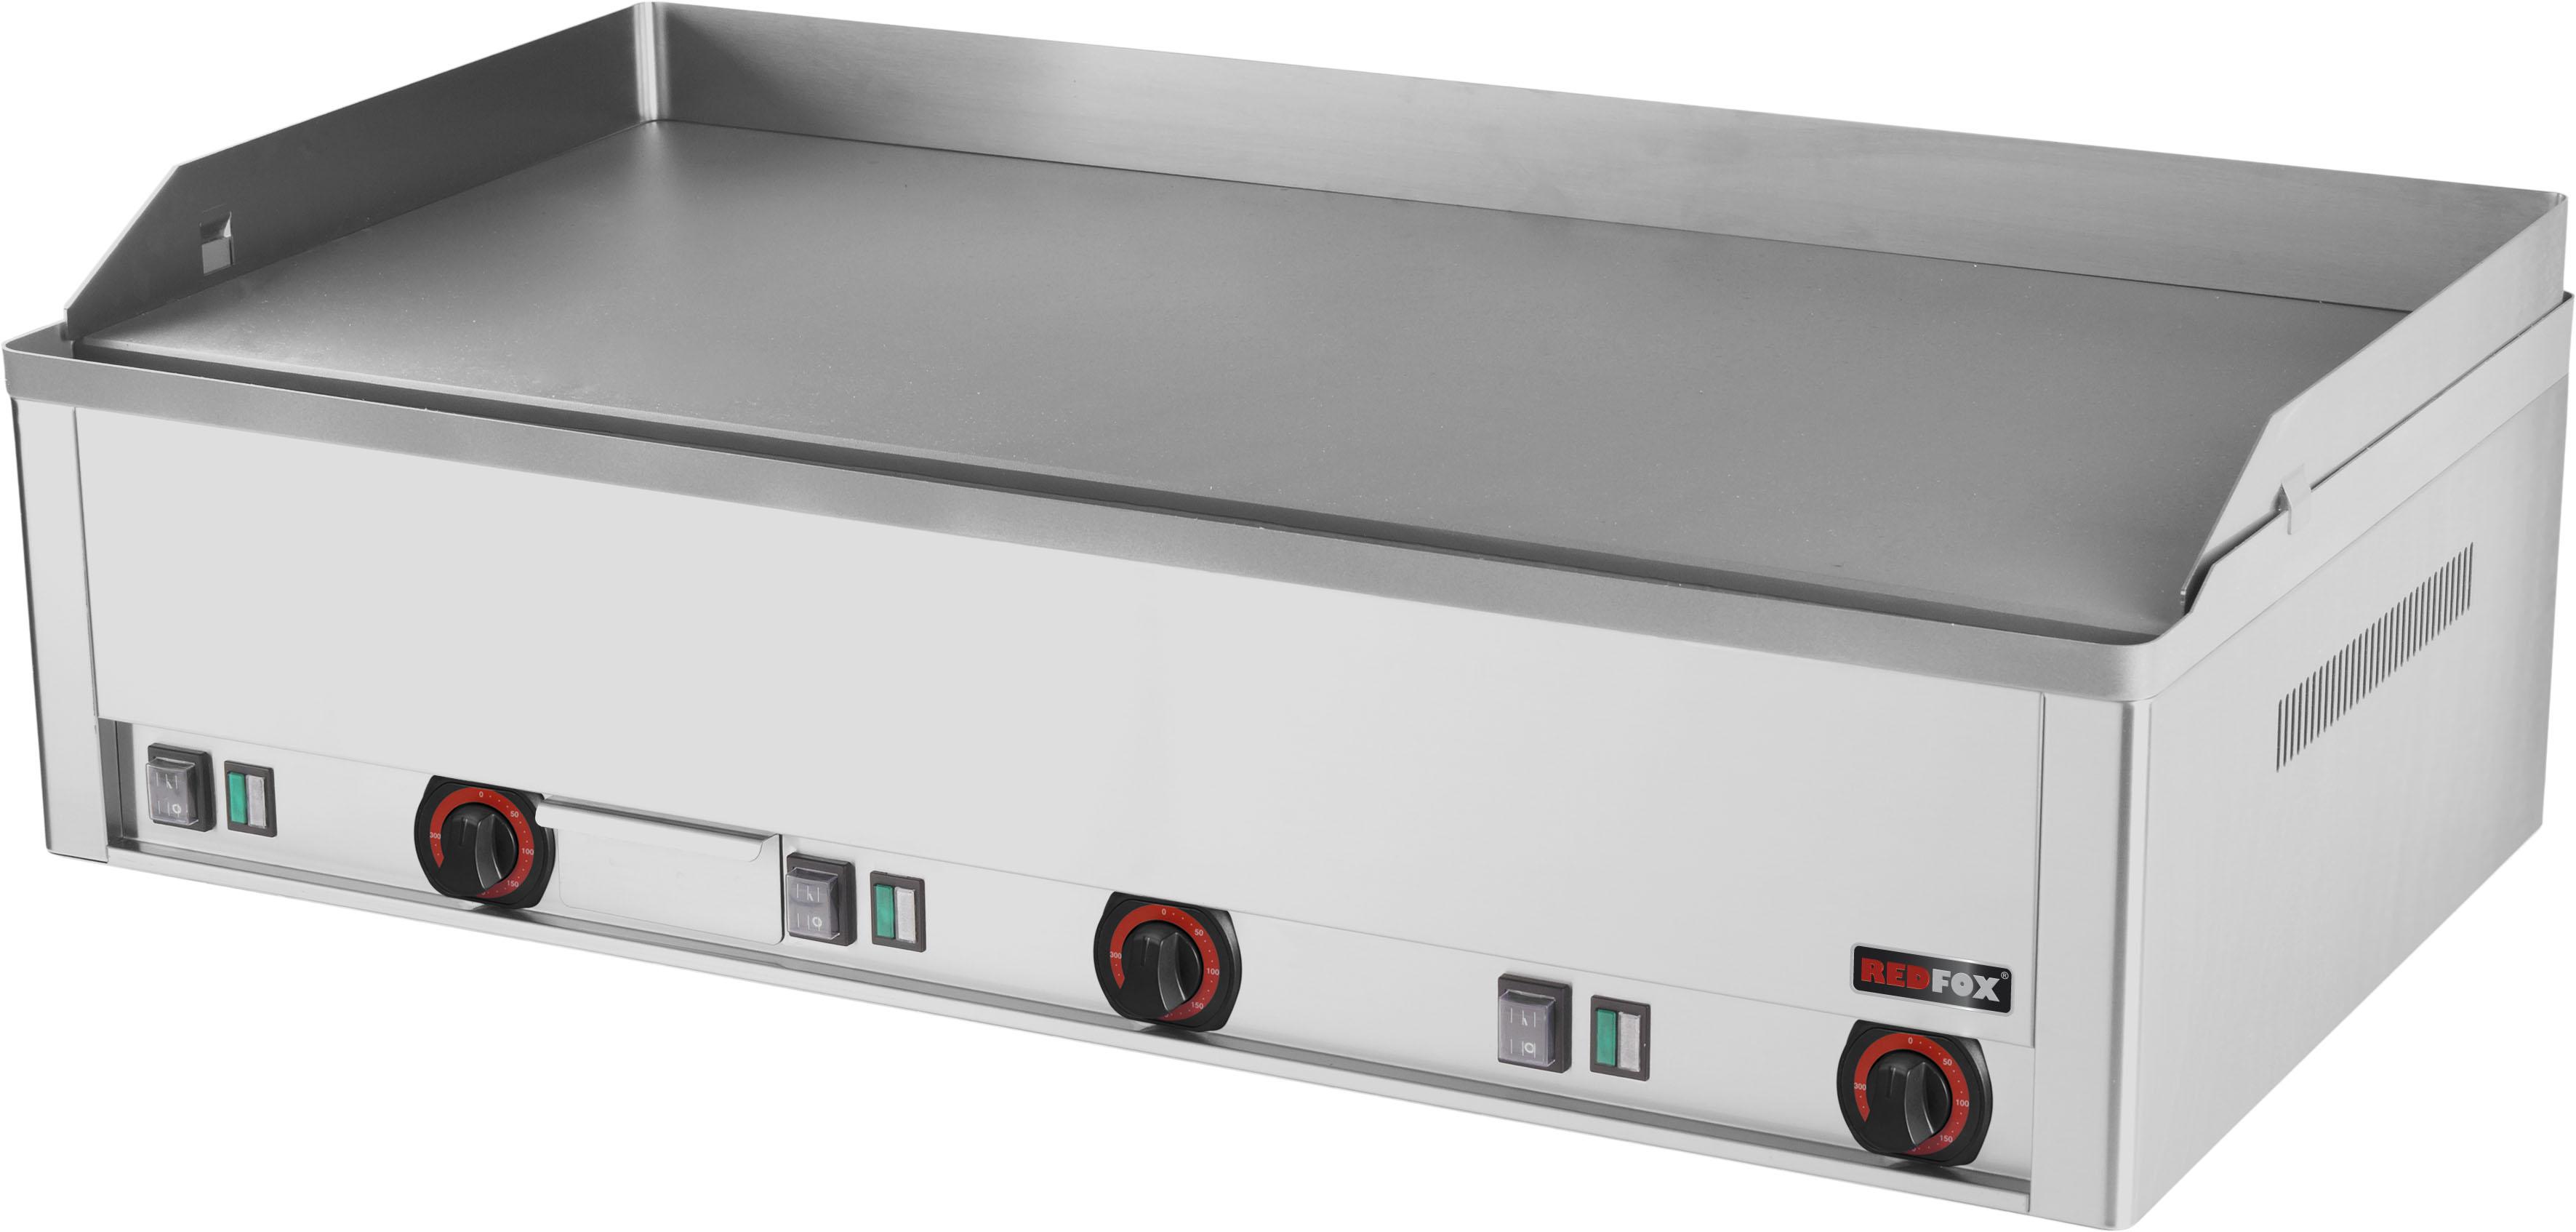 Deska grilovací elektrická FTH 90 E hladká ocelová REDFOX